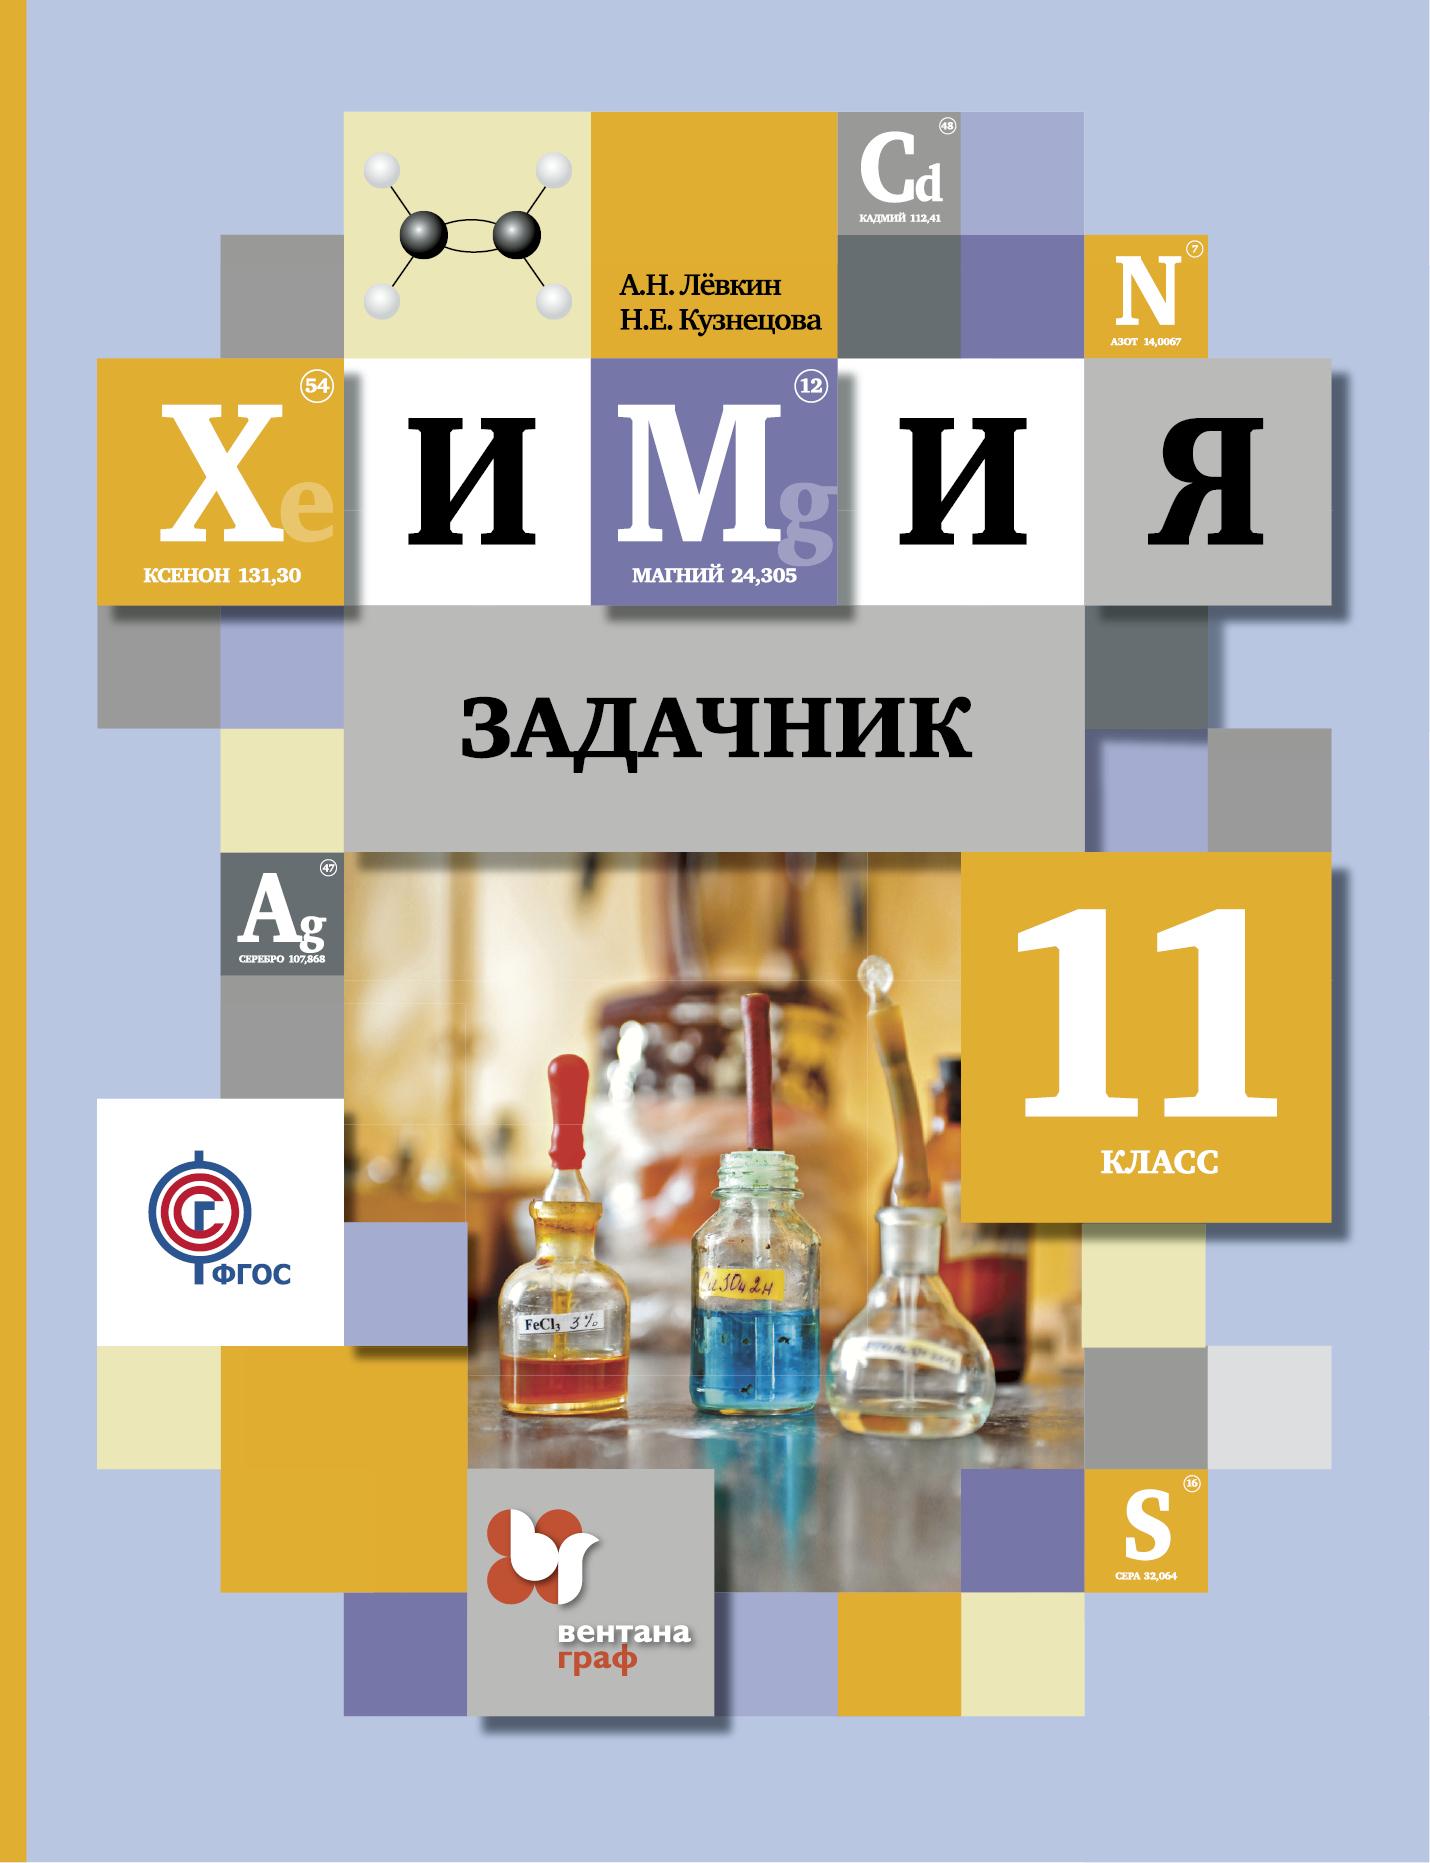 А. Н. Левкин, Н. Е. Кузнецова Химия. 11класс. Задачник н е кузнецова а н левкин химия 10 класс задачник